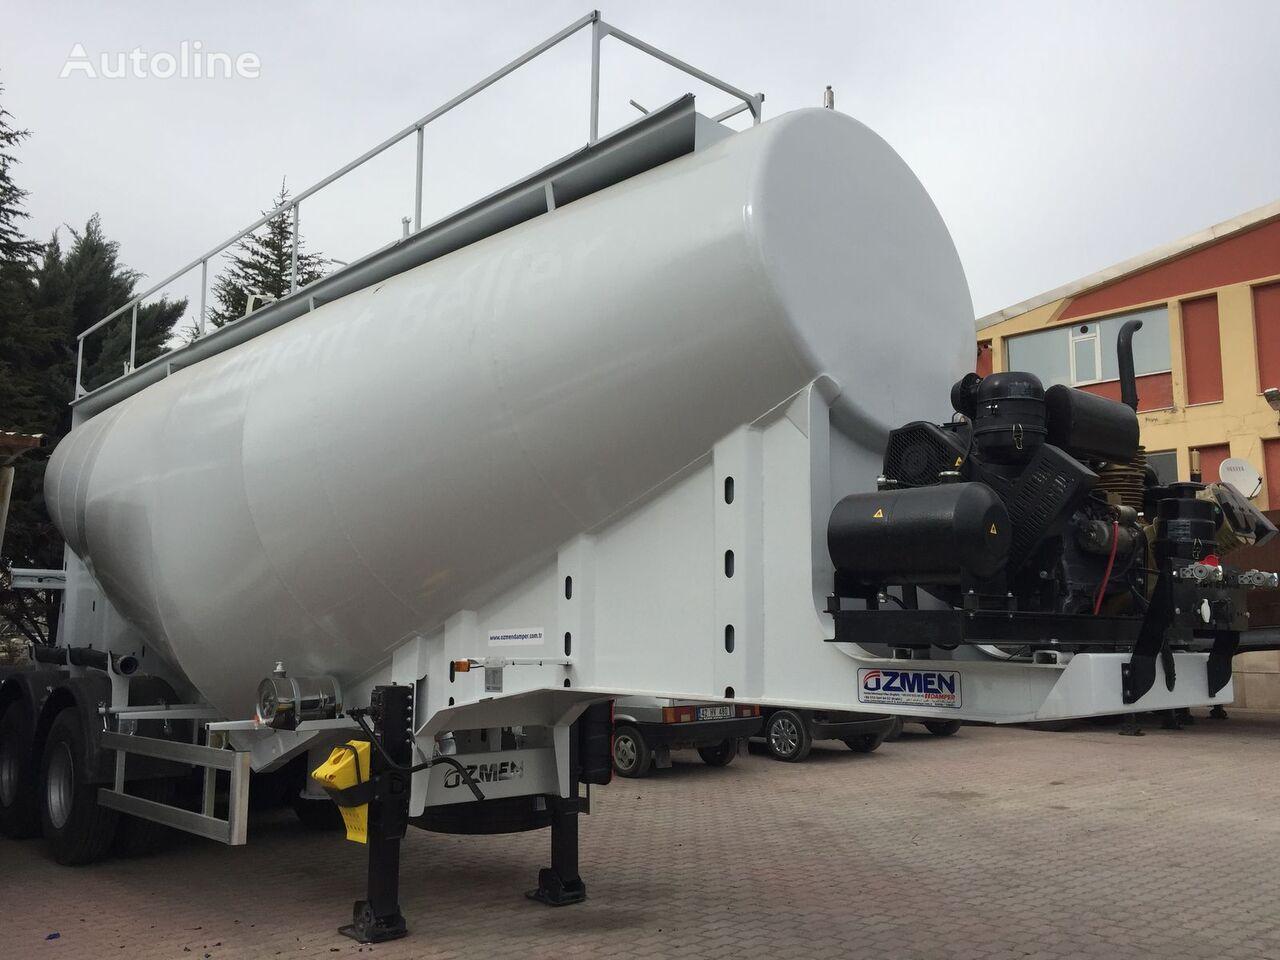 new Ozmen Damper 37-40 m3 CEMENT BULK SEMI TRAILER - DIESEL ENGINE cement tank trailer